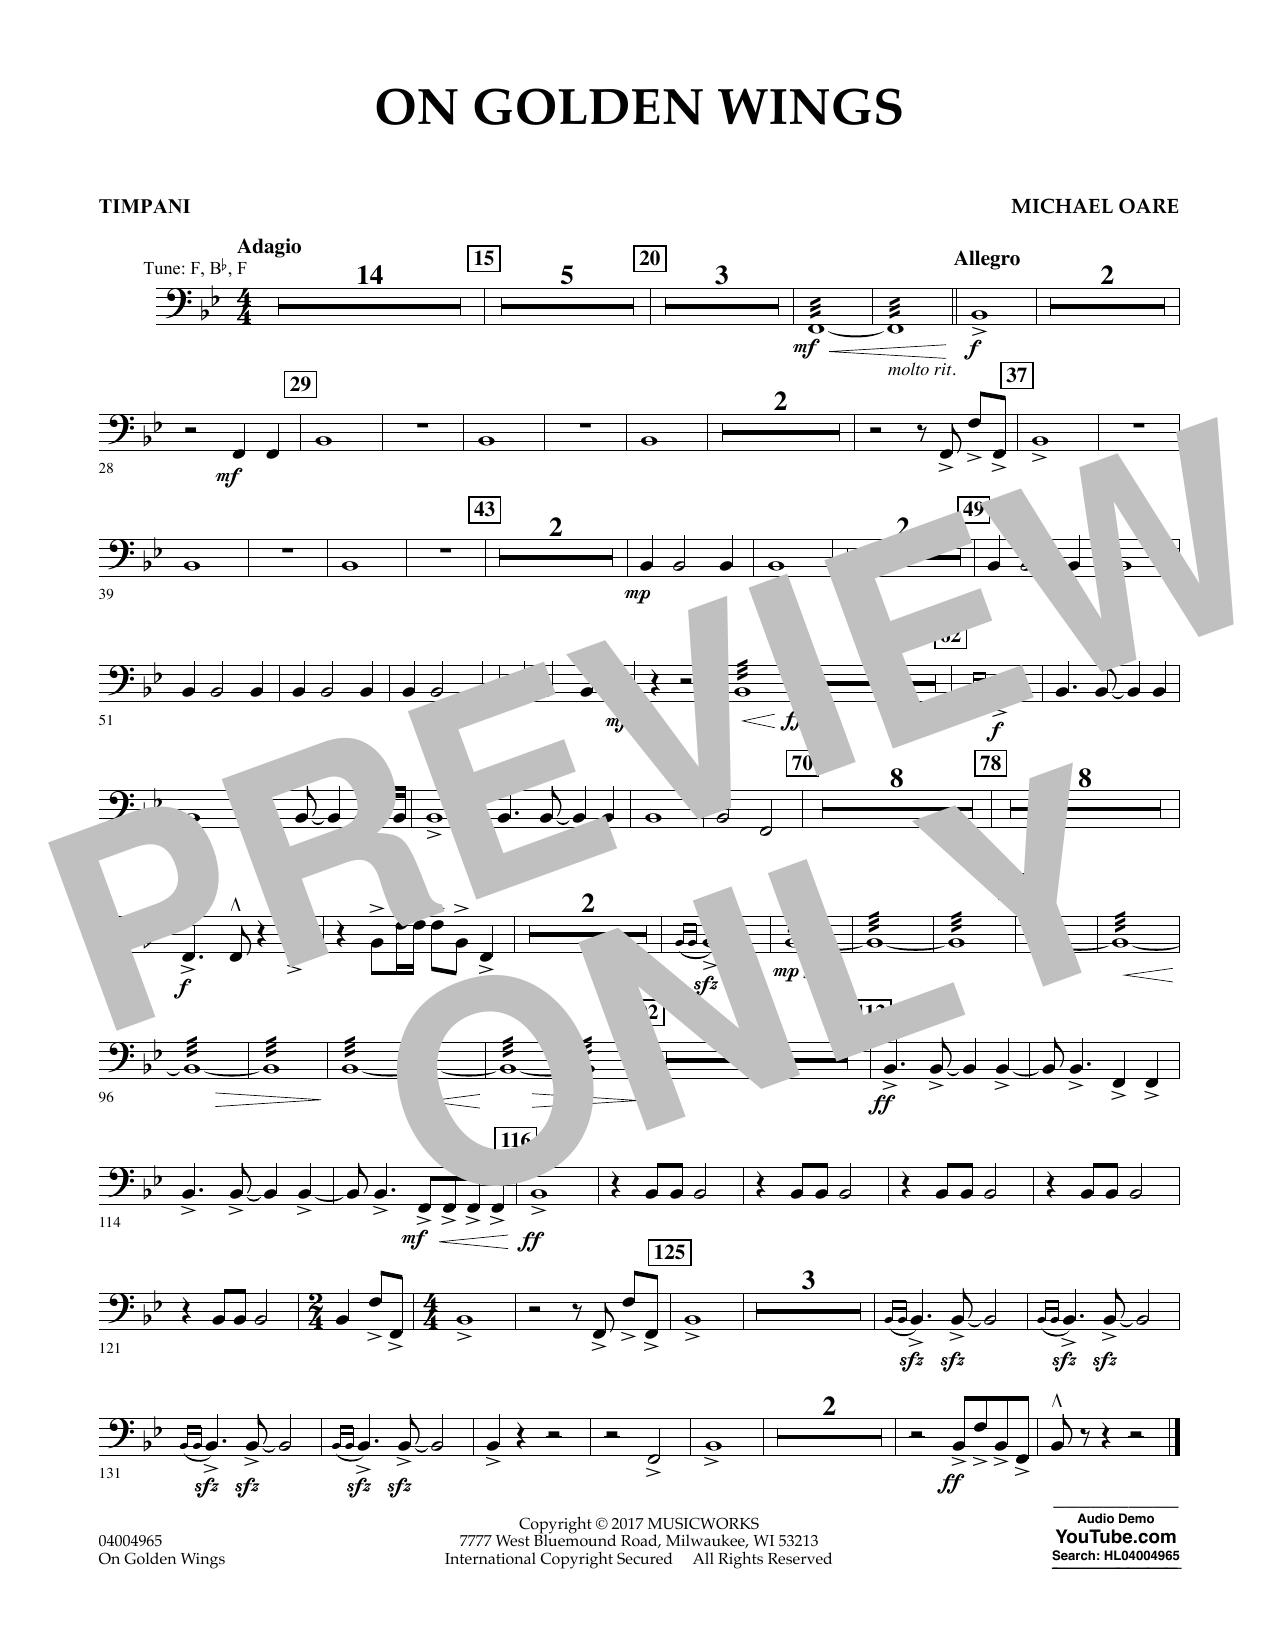 On Golden Wings - Timpani Sheet Music